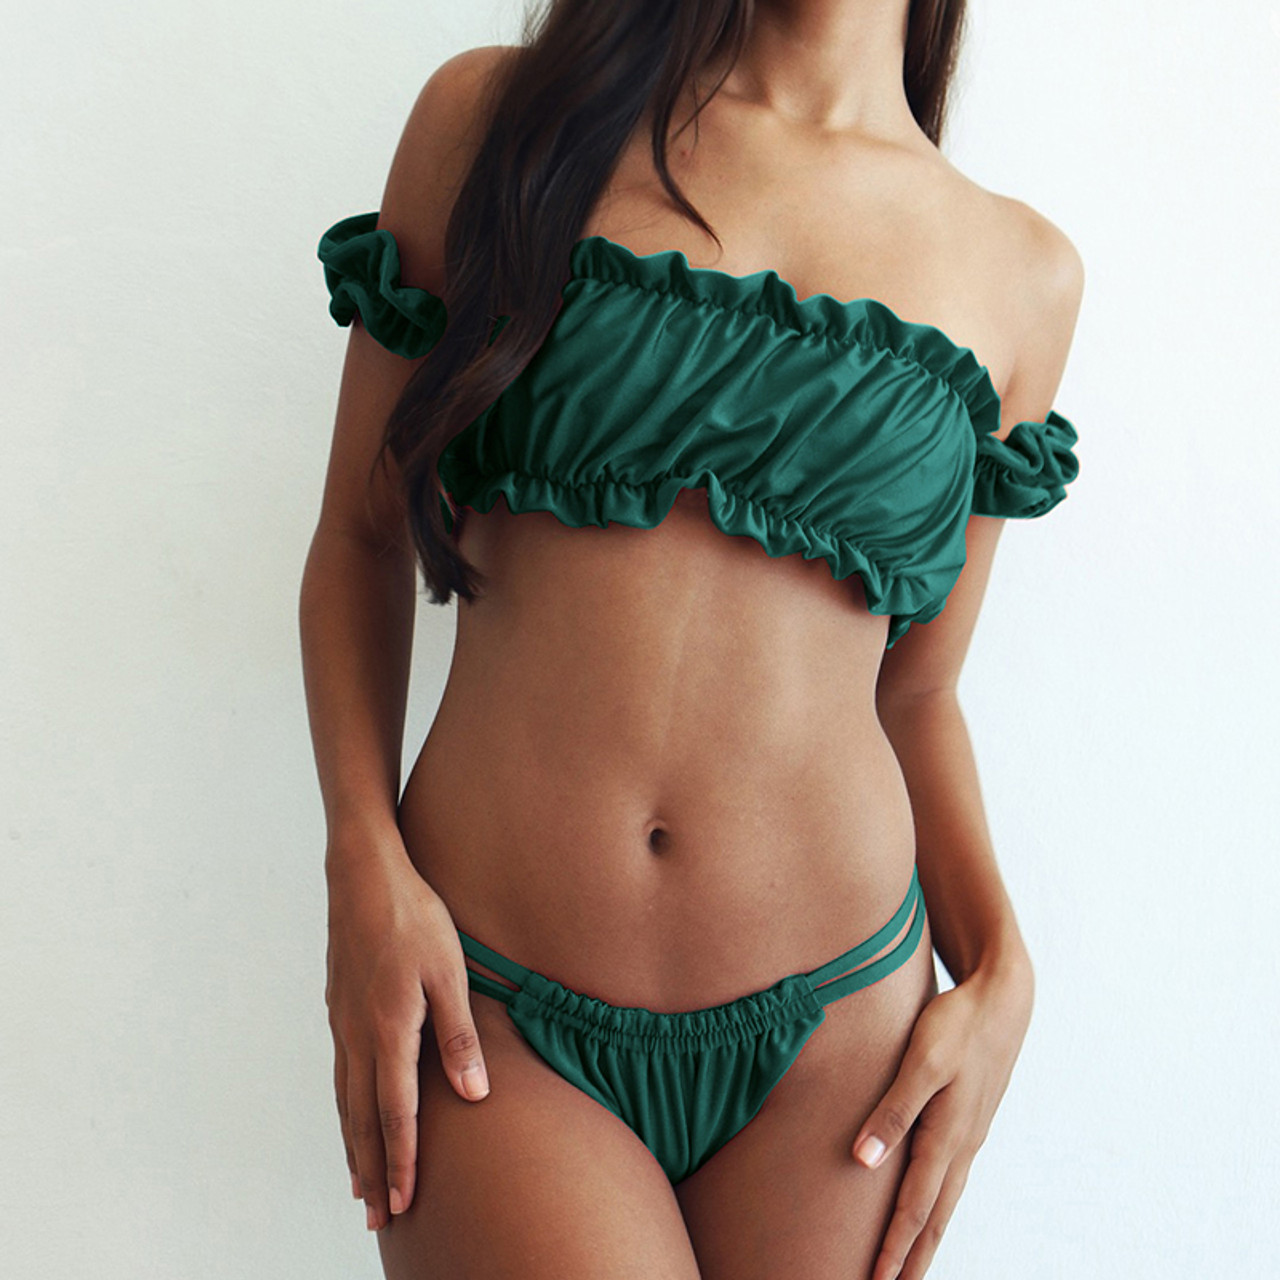 2ef9b0cefcb Bandage Brazilian Bikini 2019 swimming suit Women Swimwear Push Up Swimsuit  Female Bathing Suit bikinis Beach ...